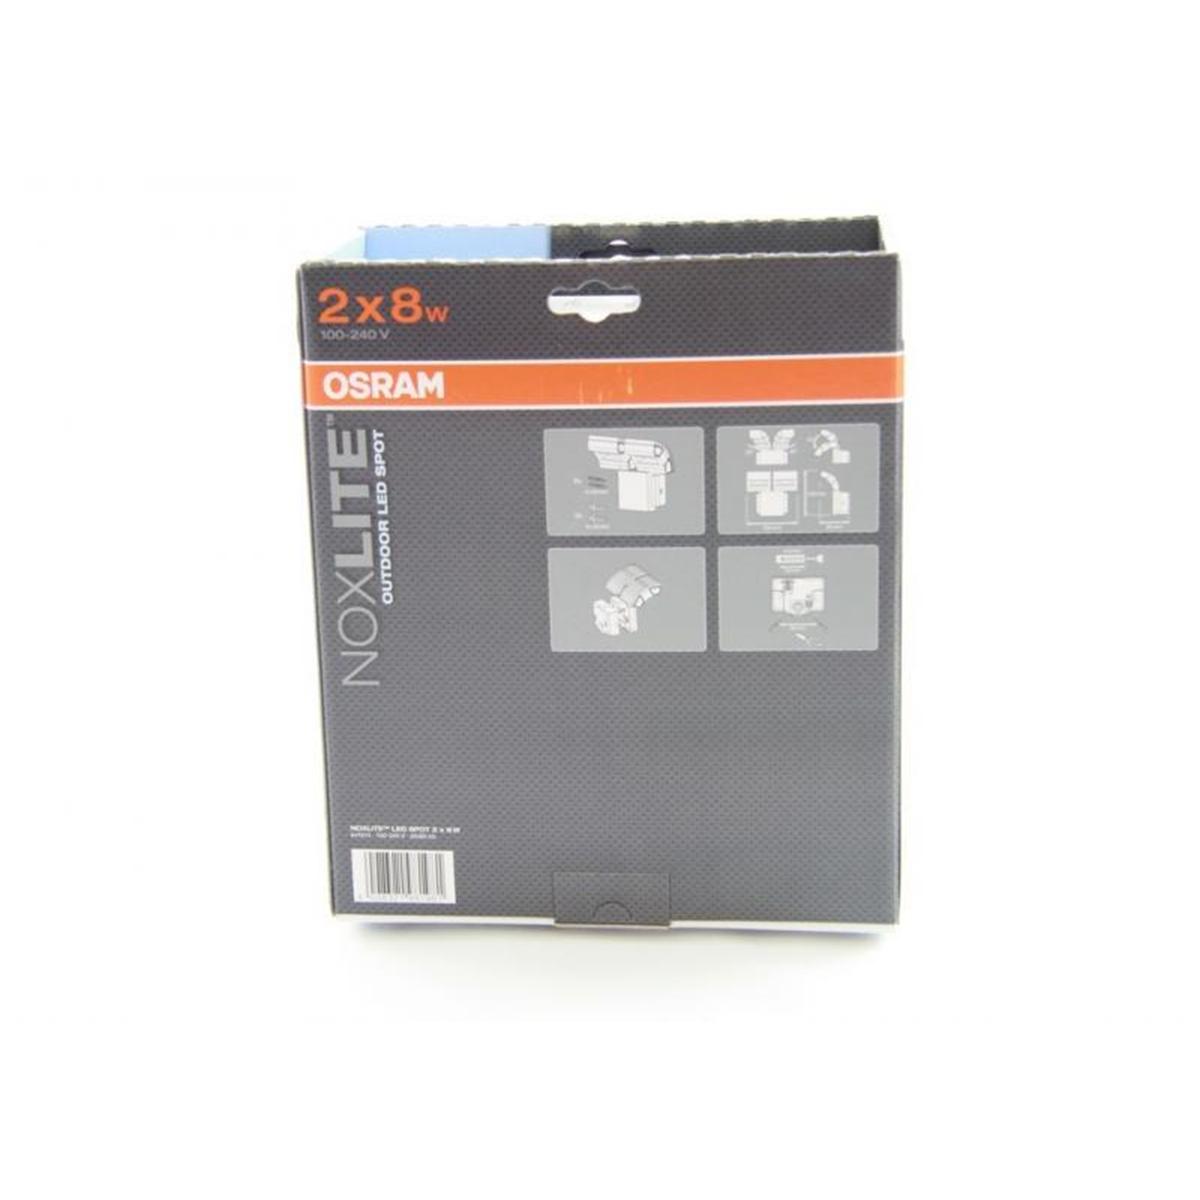 Specjalna oprawa oświetl  LED 41014 NOXLITE LEDSPOT GR 2X8W